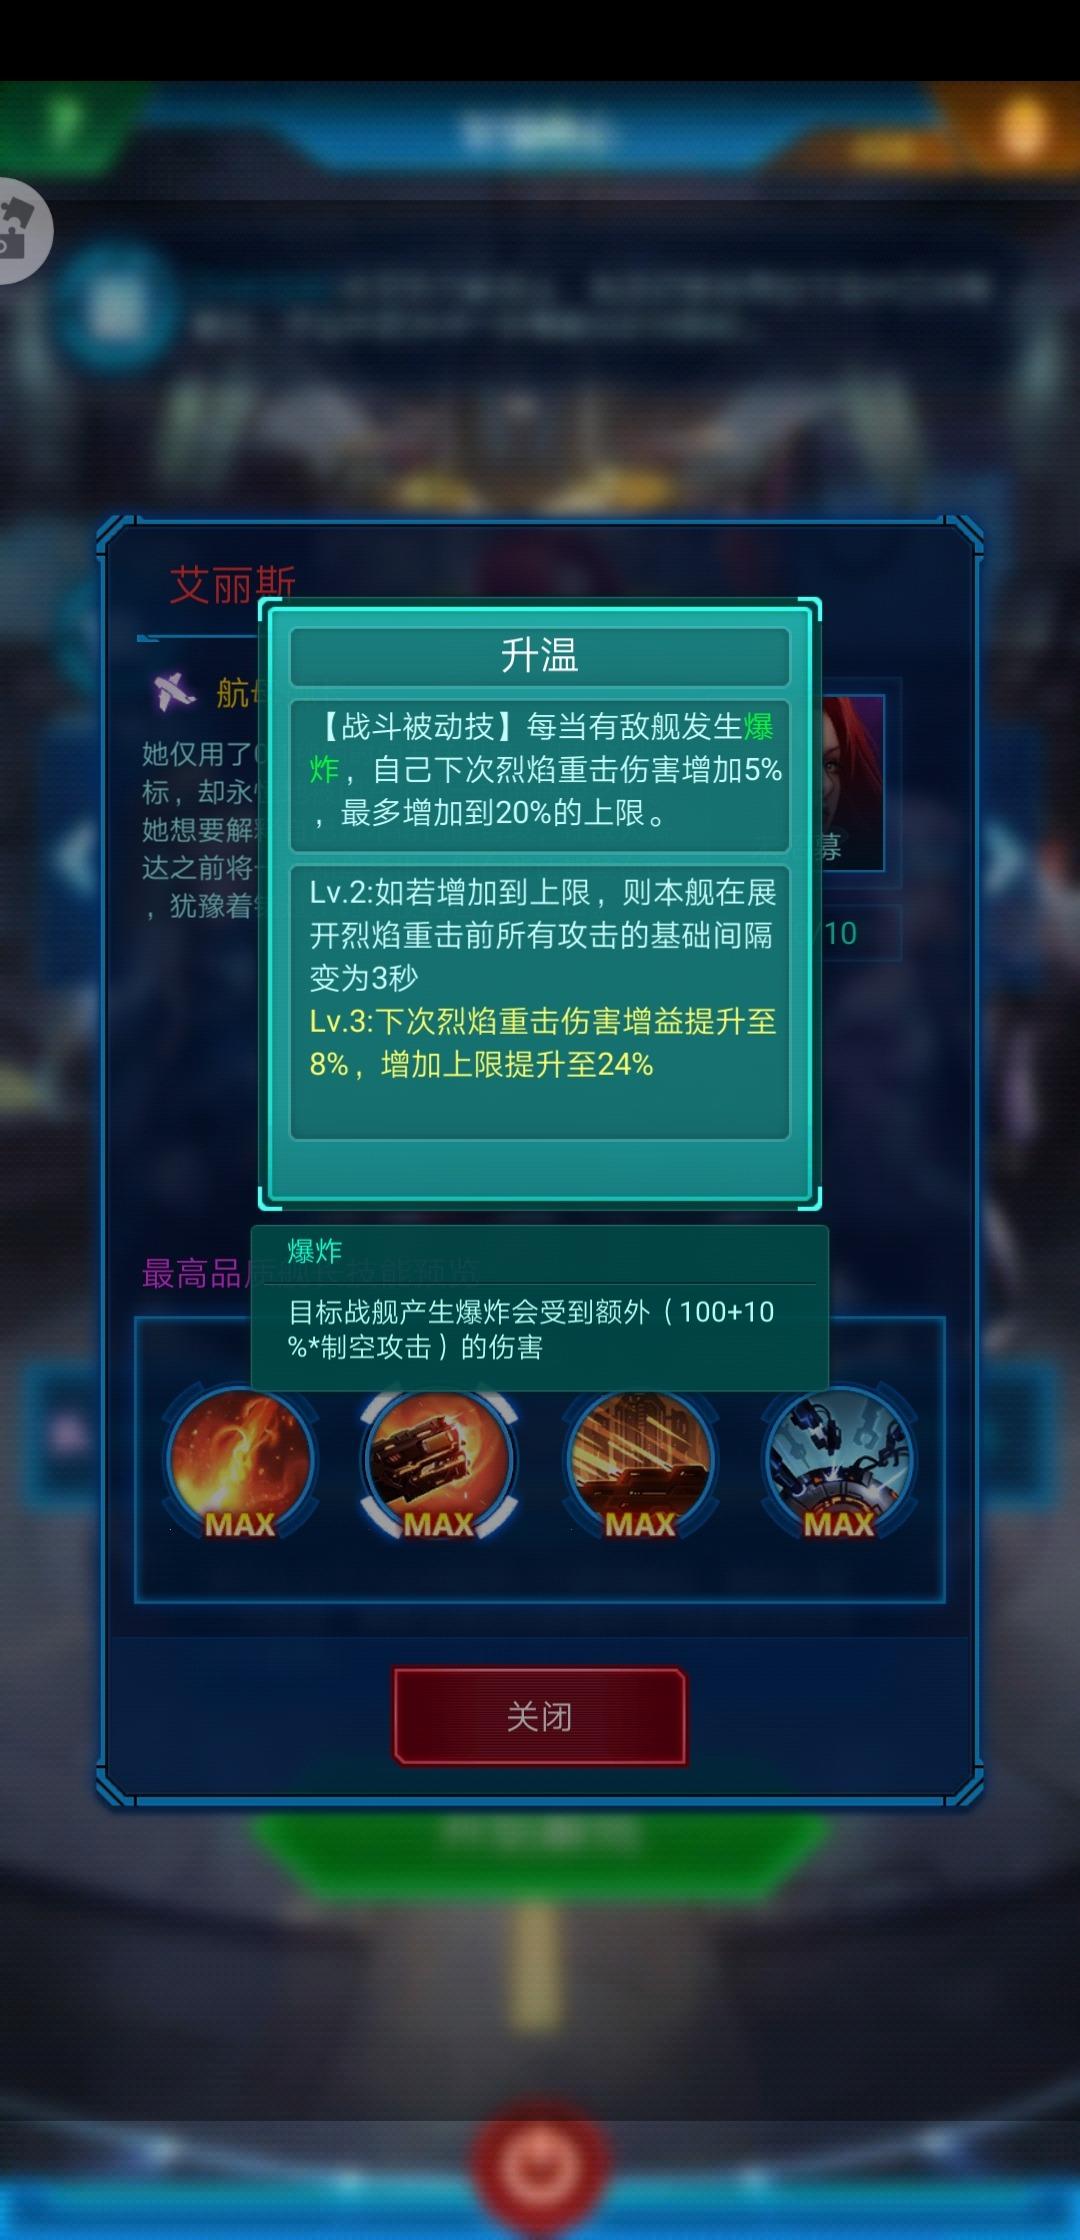 Screenshot_20191216_125514_com.jedigames.p16s.huawei.jpg